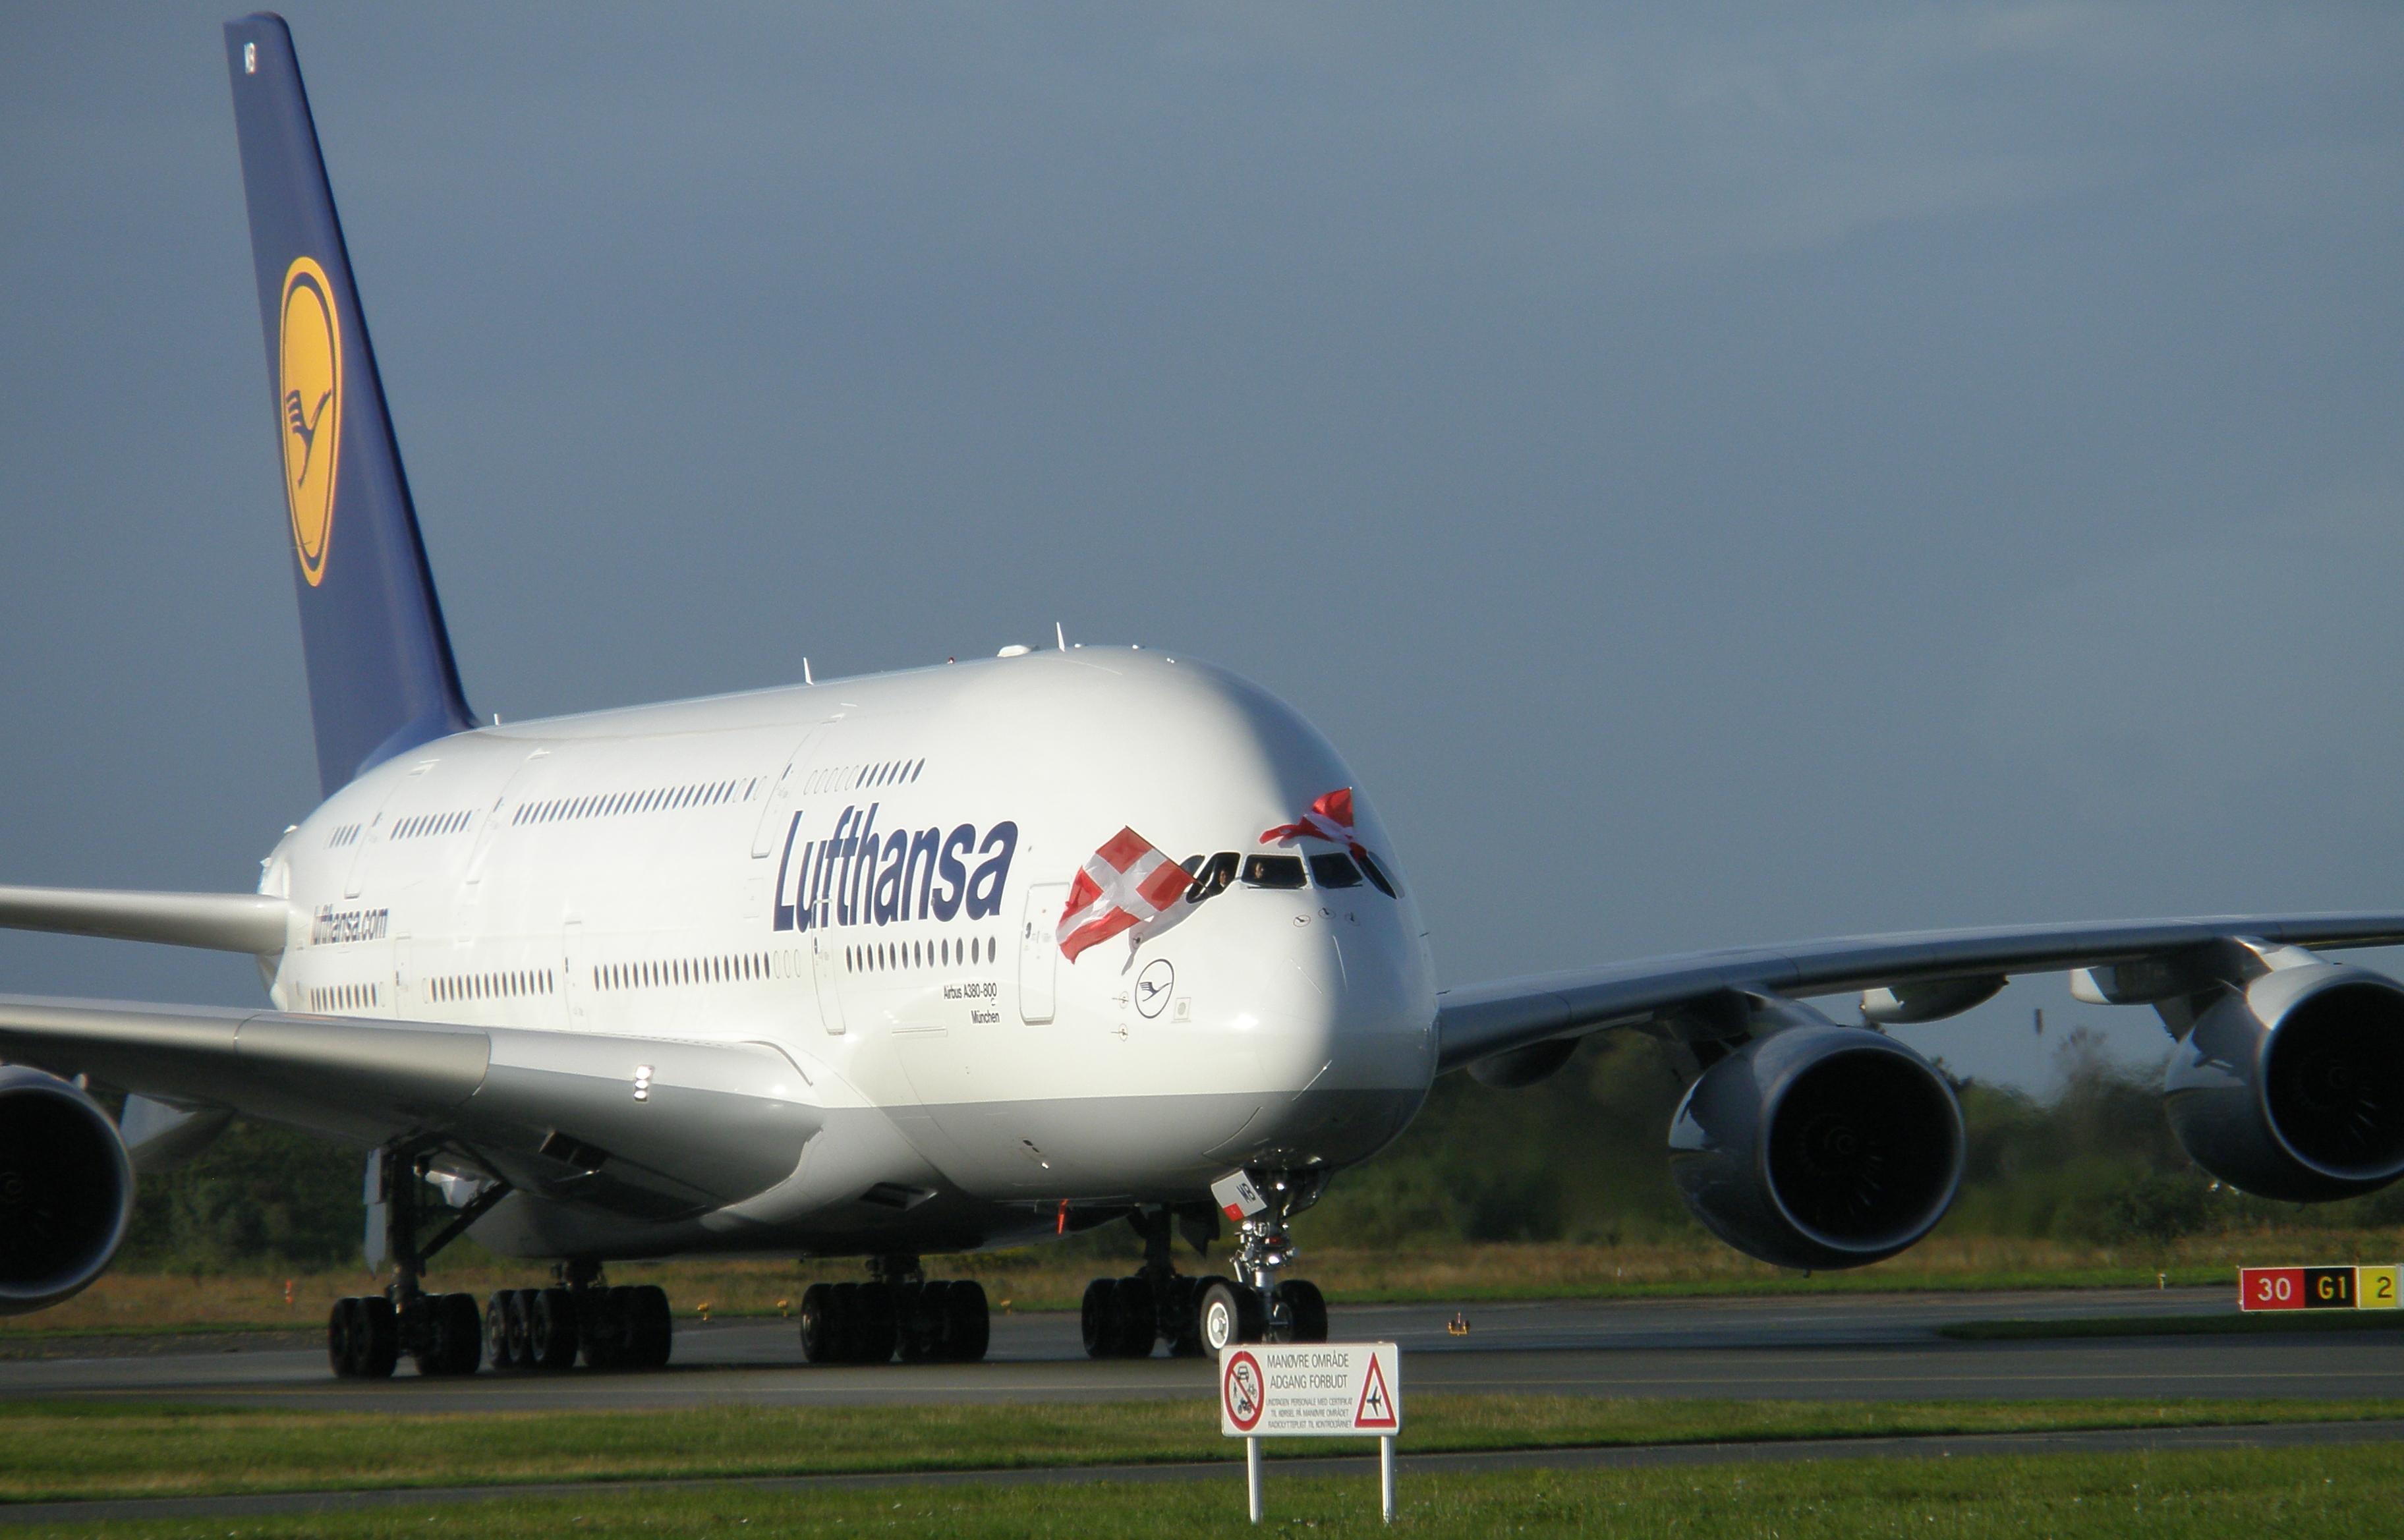 Lufthansa Airbus A380 i Københavns Lufthavn, 15. september 2010 (Foto: Ole Kirchert Christensen)